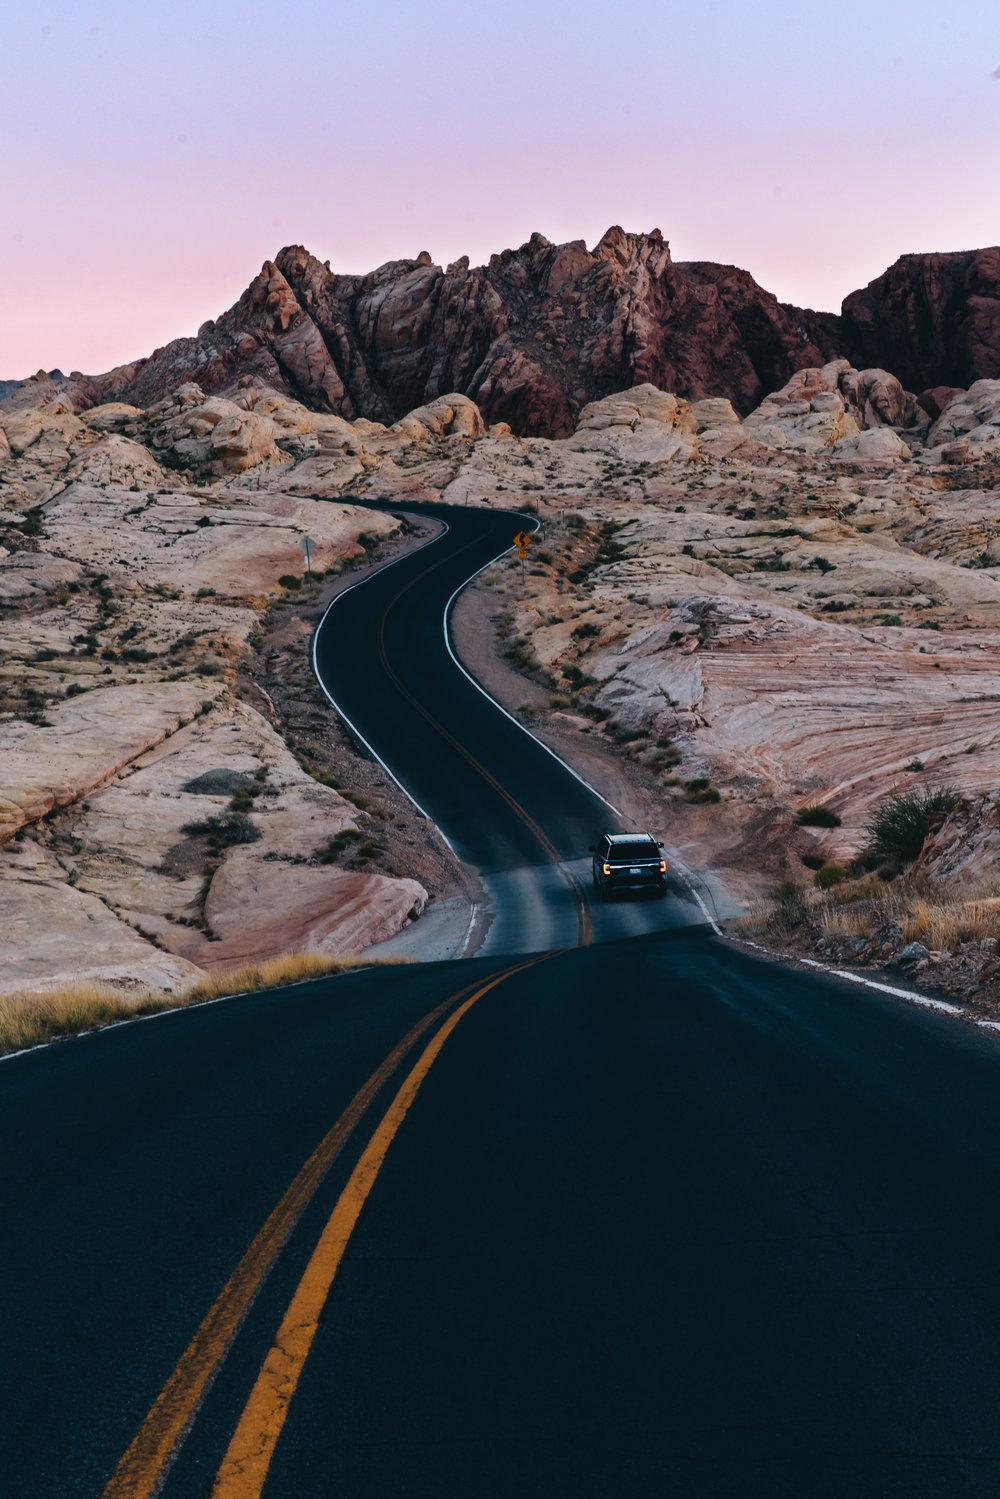 US_Roadtrip_2018-13_less_contrast.JPG